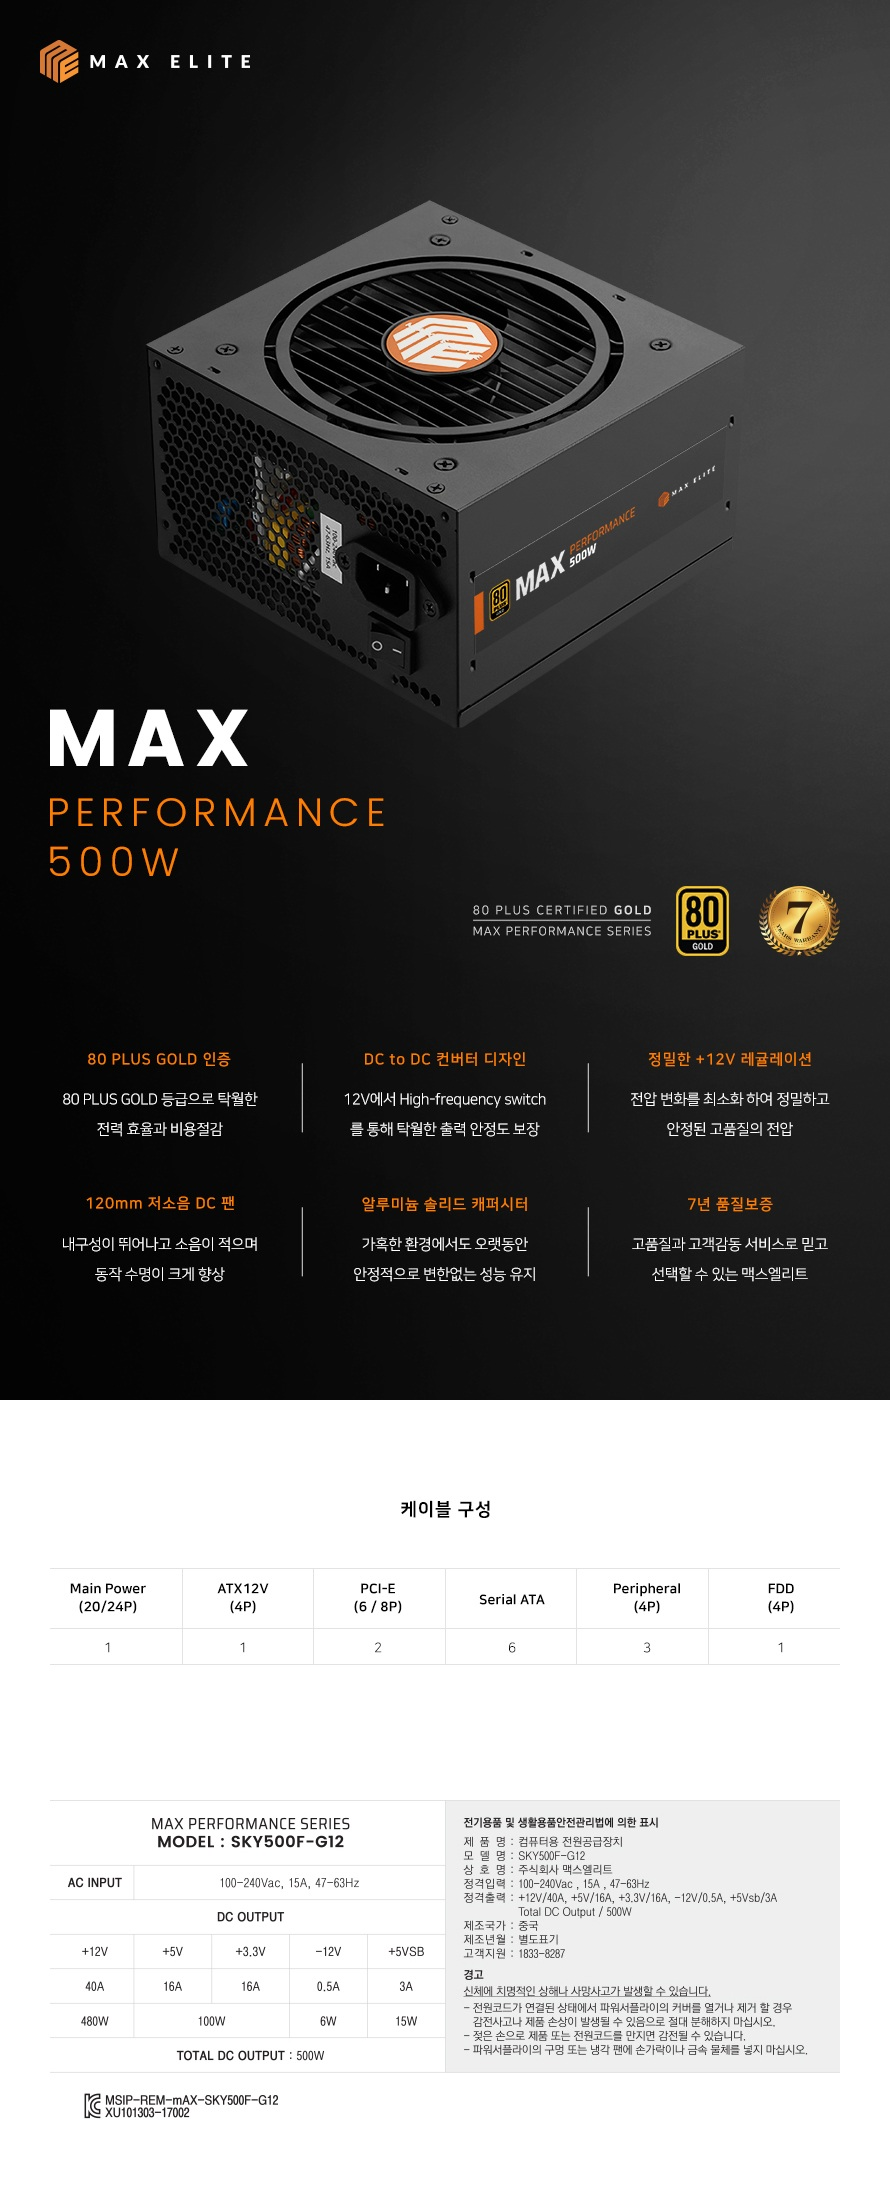 MAX Performance 500W 80PLUS GOLD.jpg